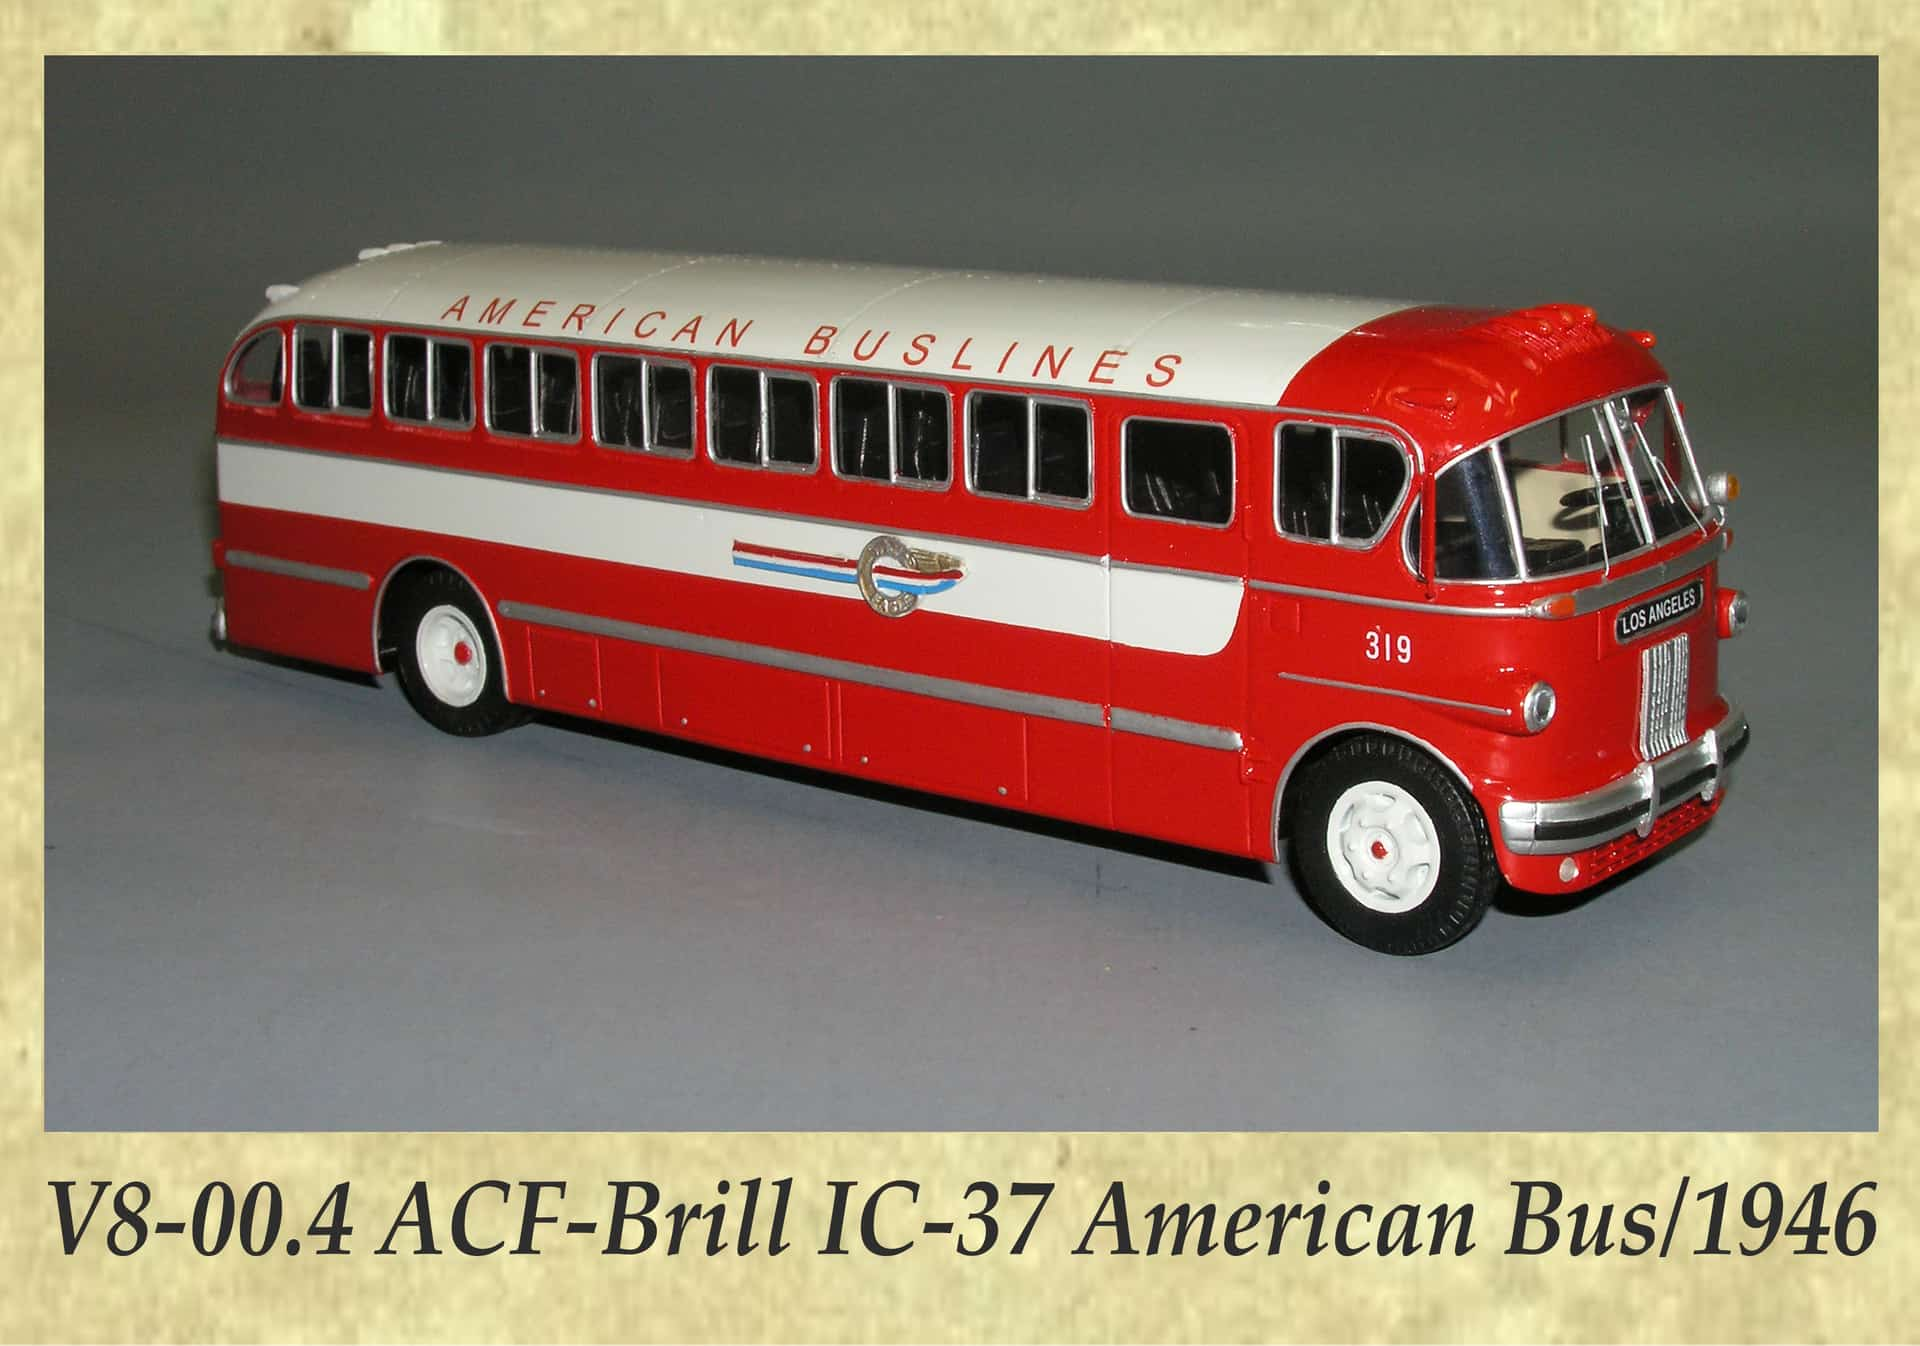 V8-00.4 ACF-Brill IC-37 American Bus_1946